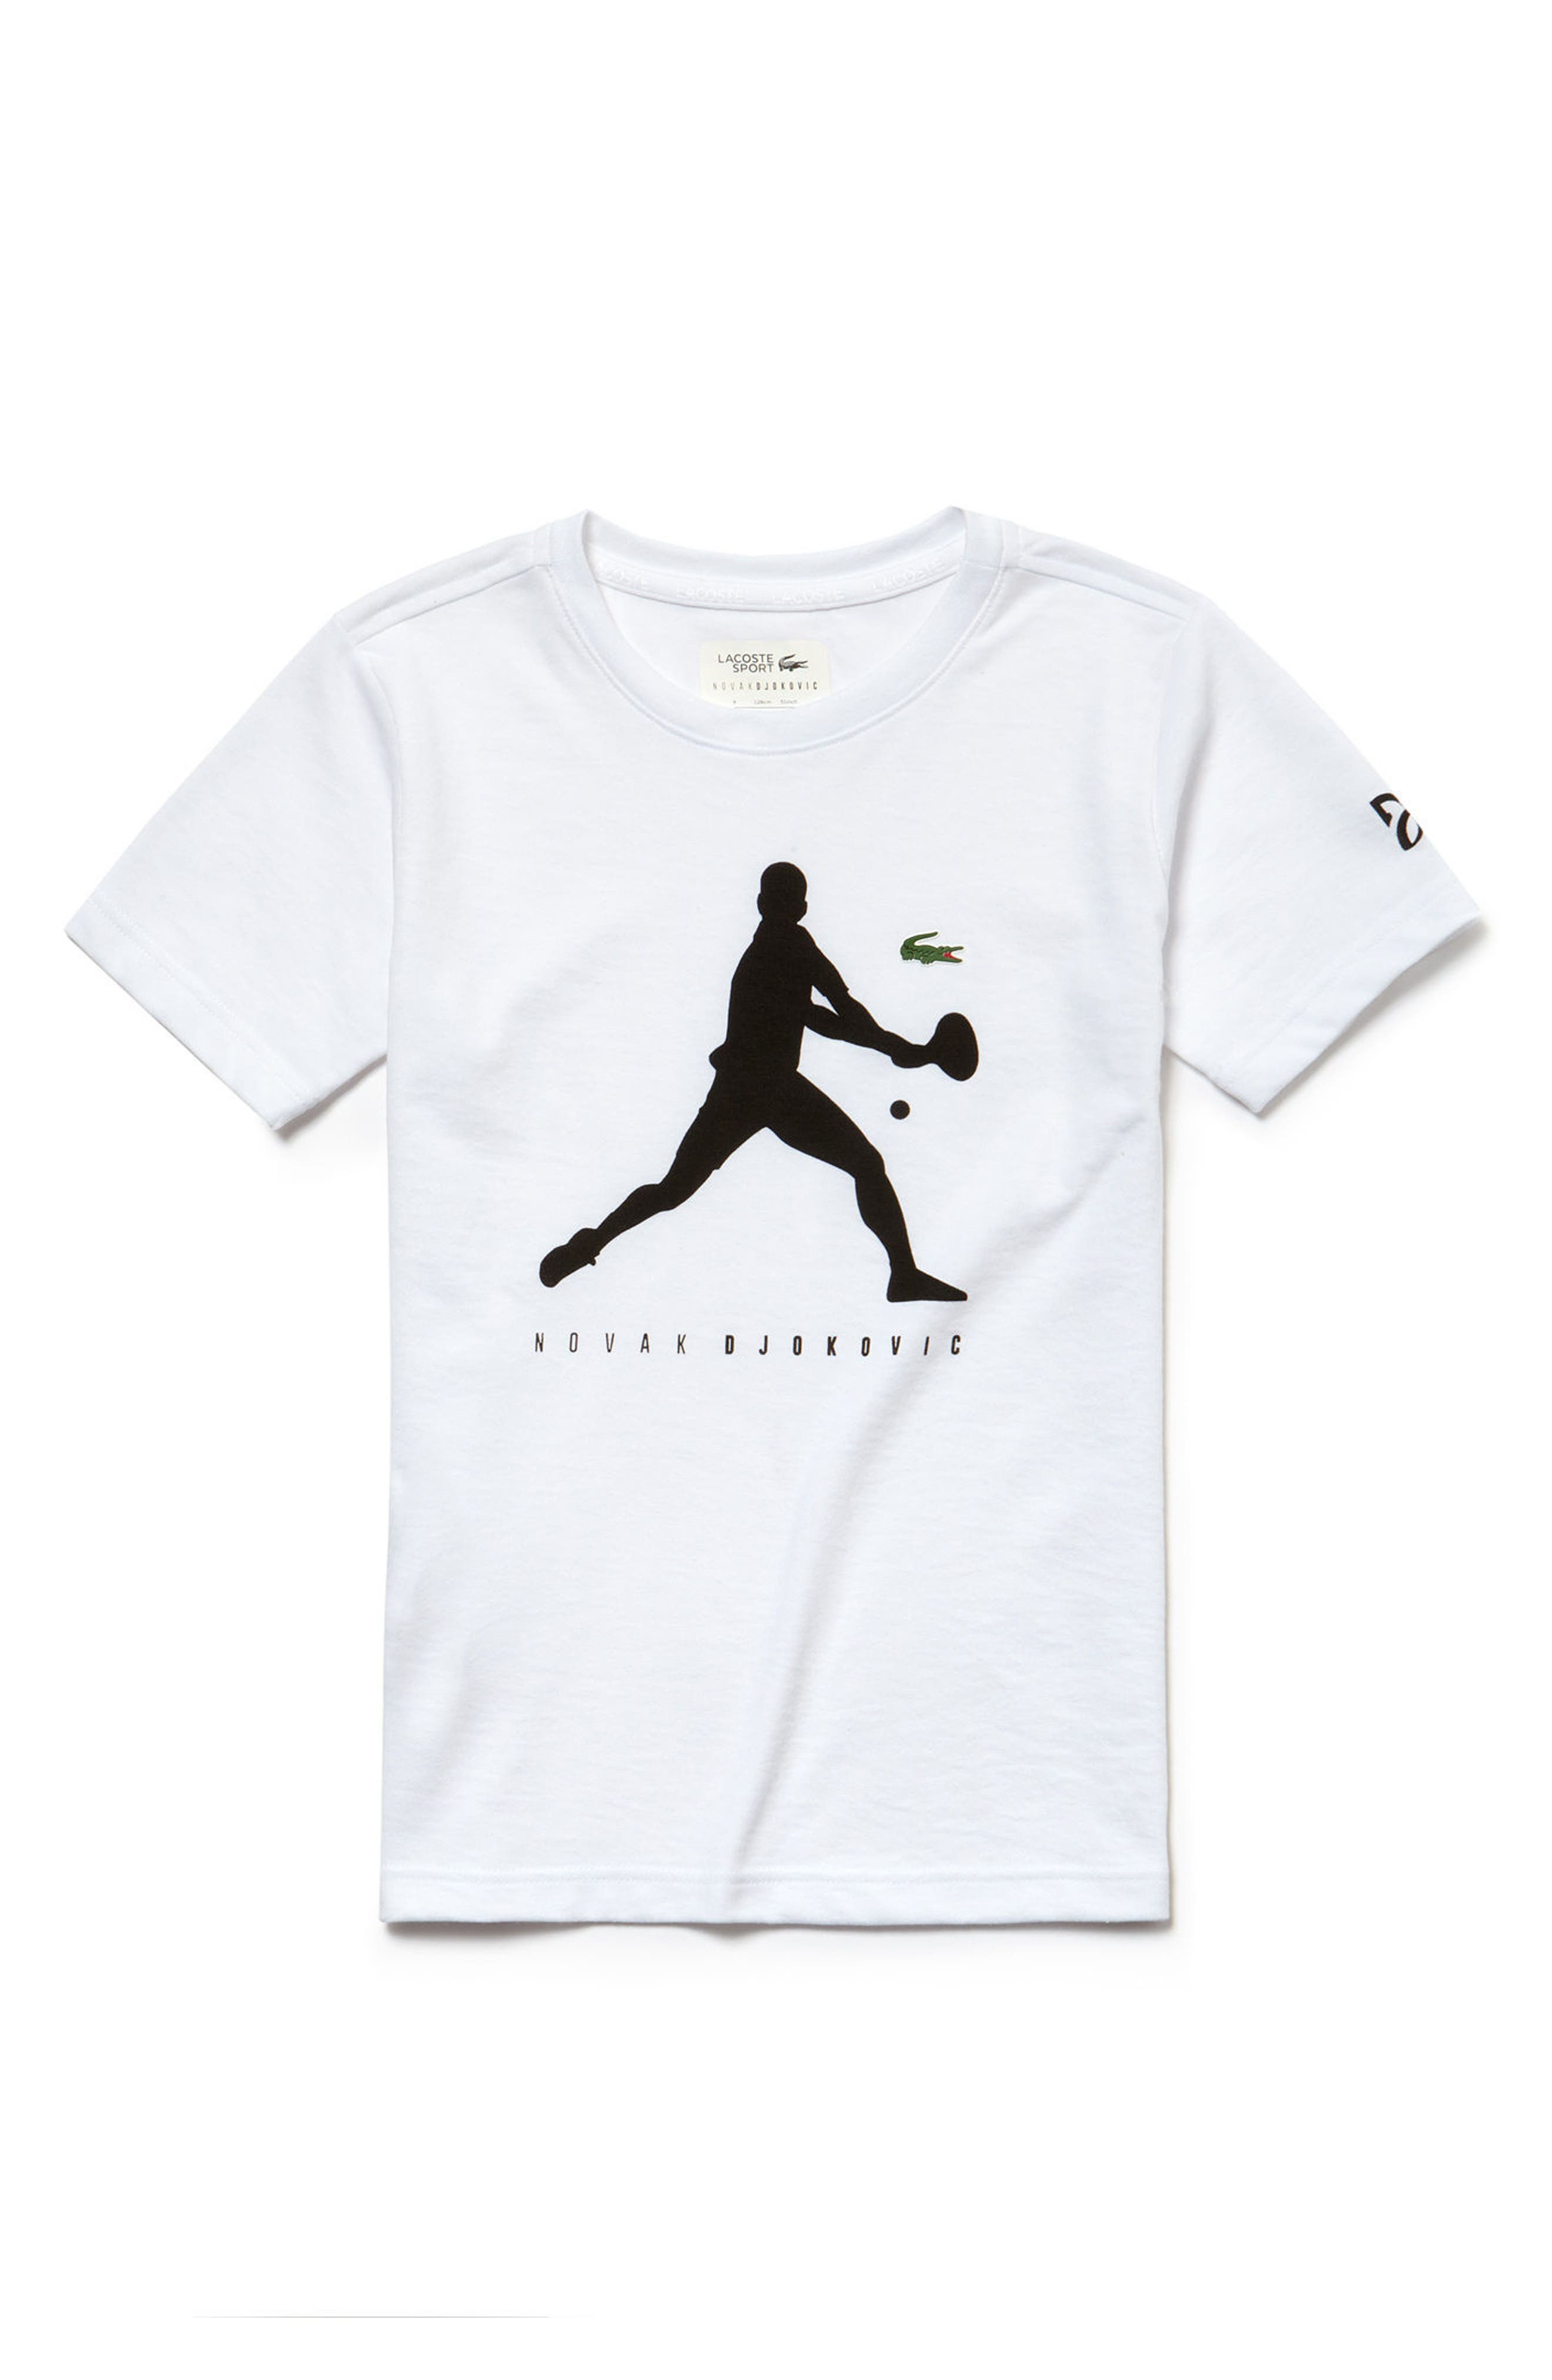 Novak Djokovic Graphic T-Shirt,                             Main thumbnail 1, color,                             135